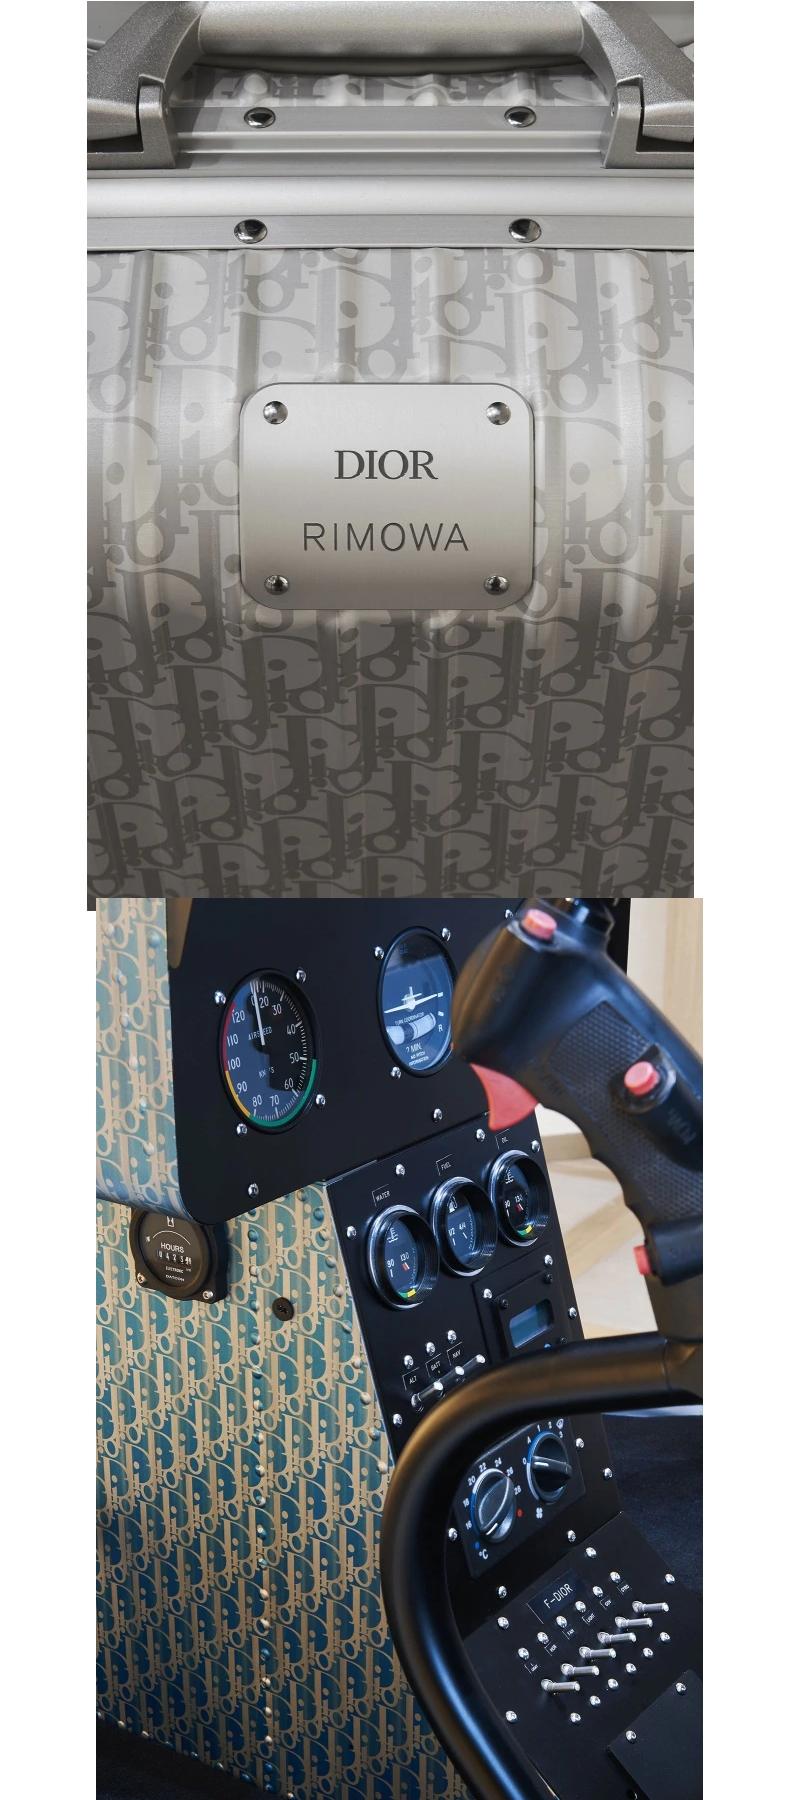 Dior x Rimowa collaboration 2019-2020-03